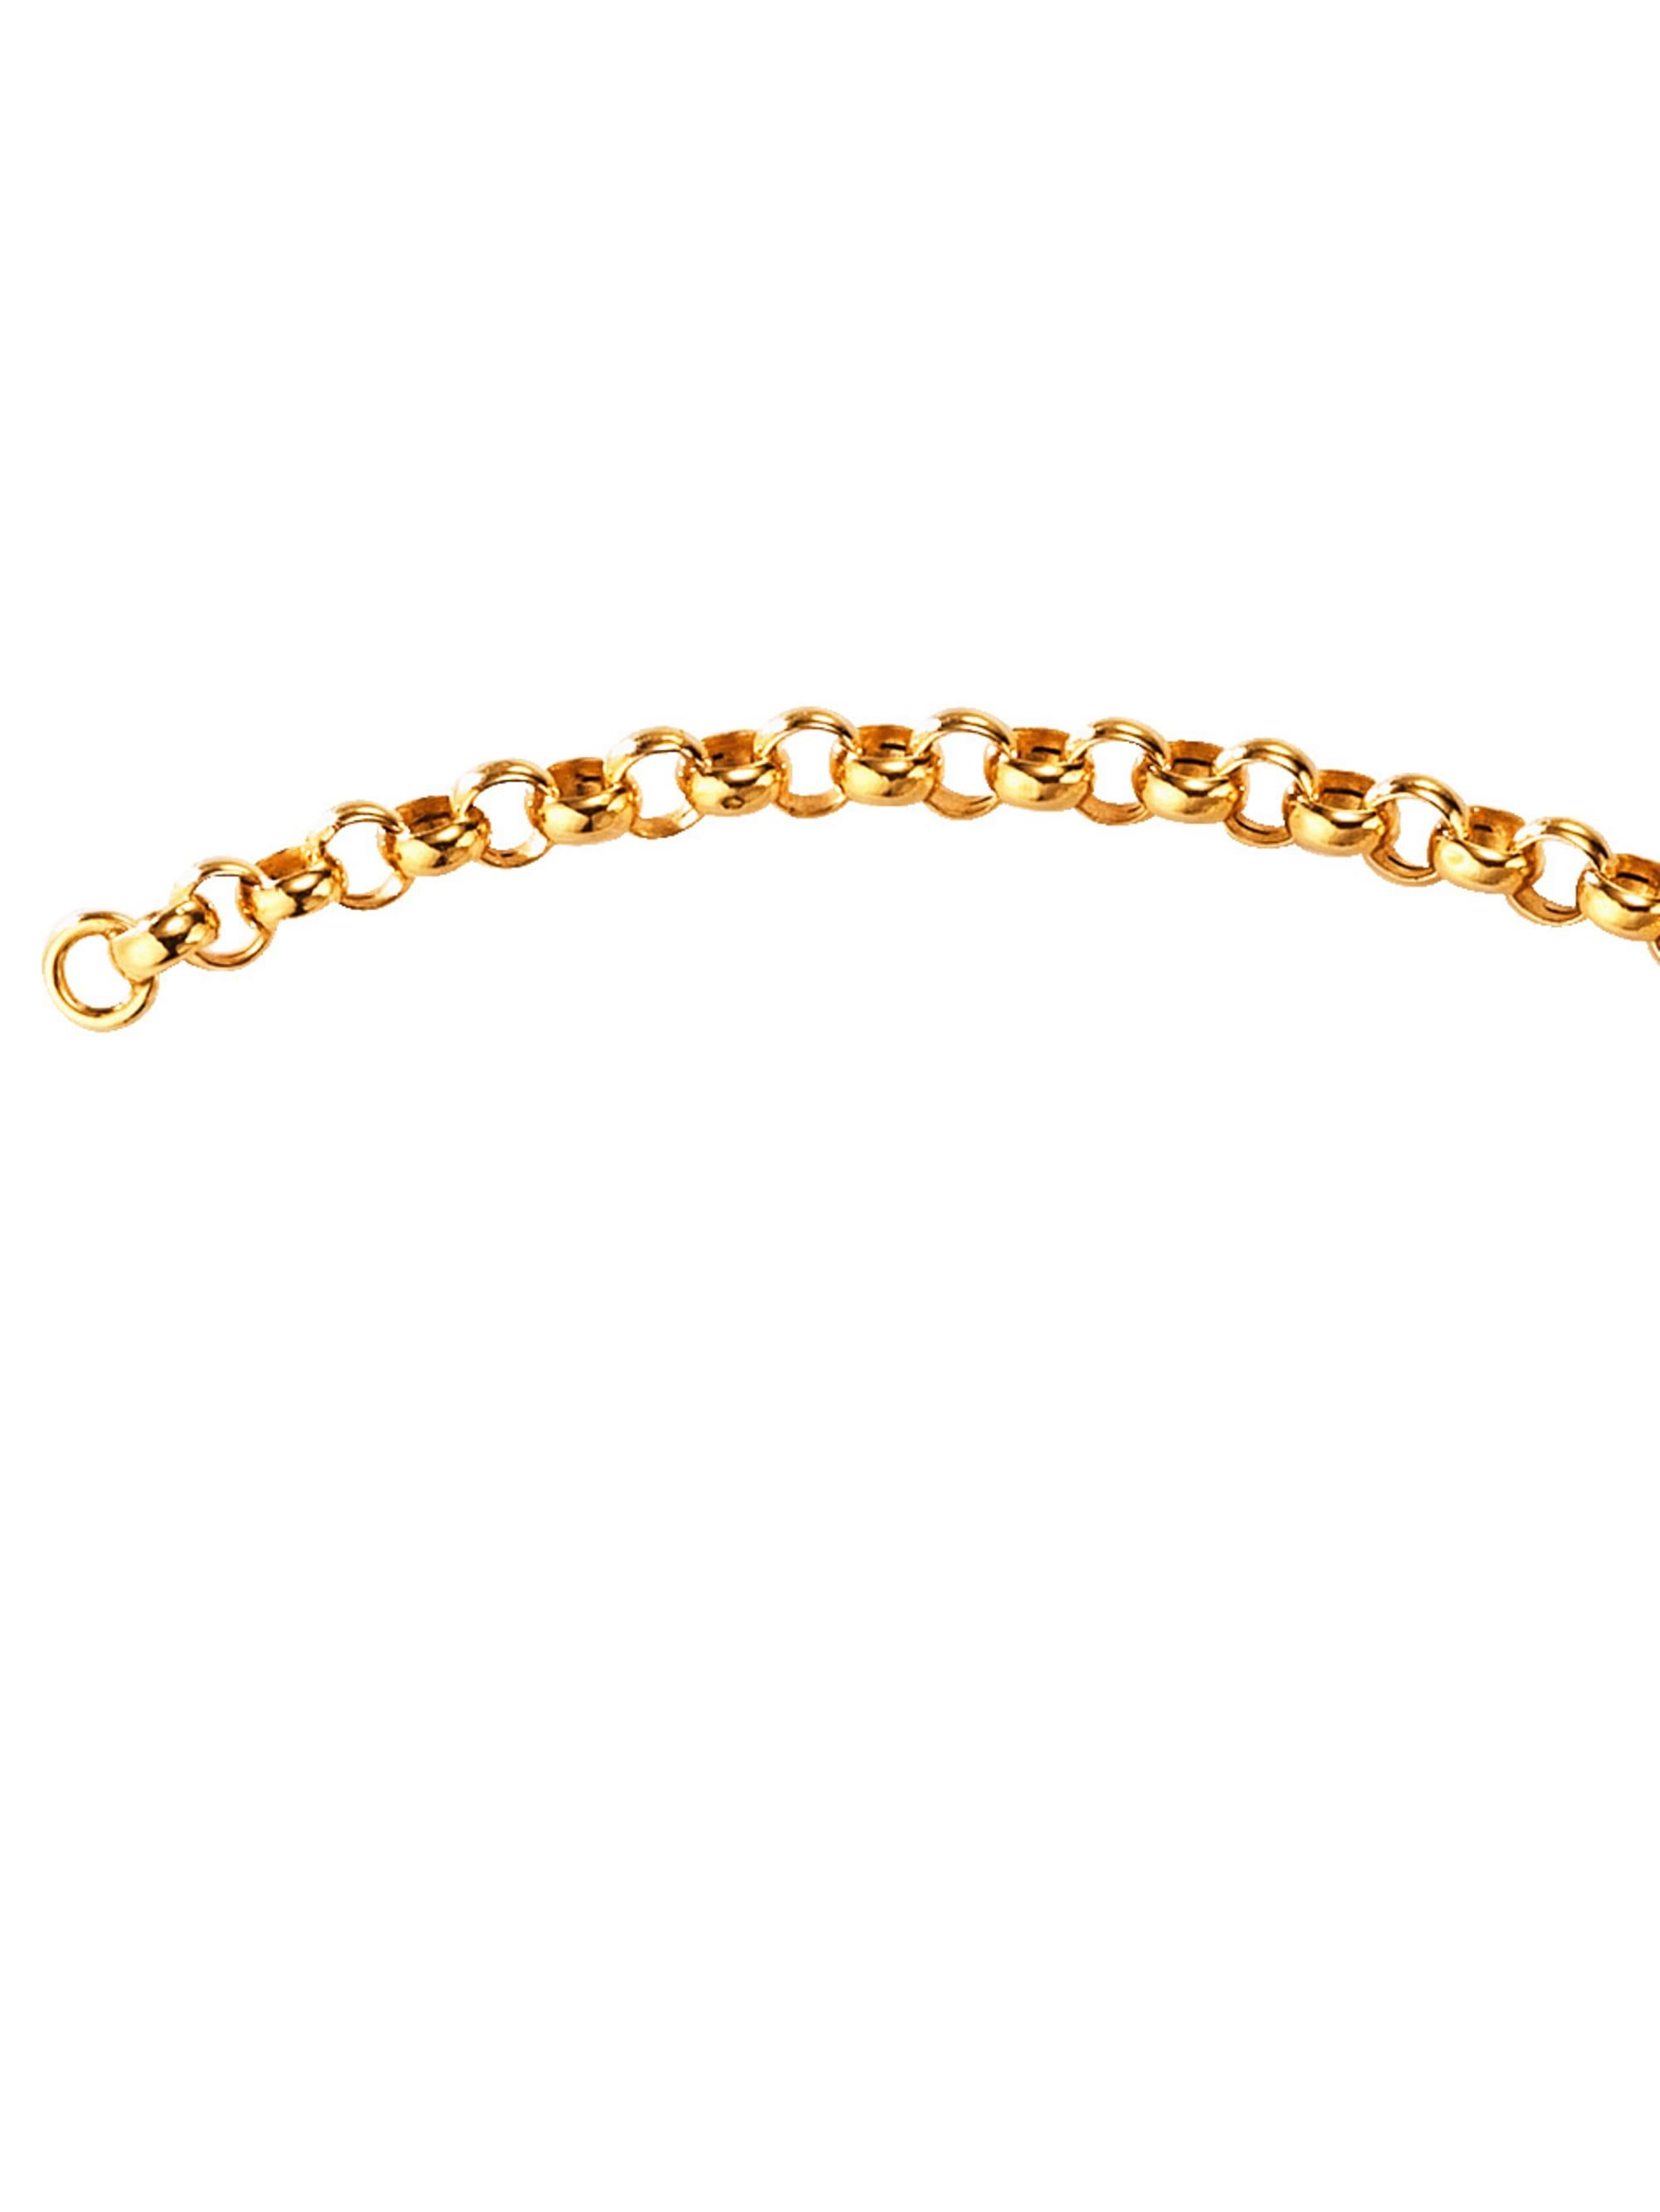 Erbsarmband in Gelbgold Rym10